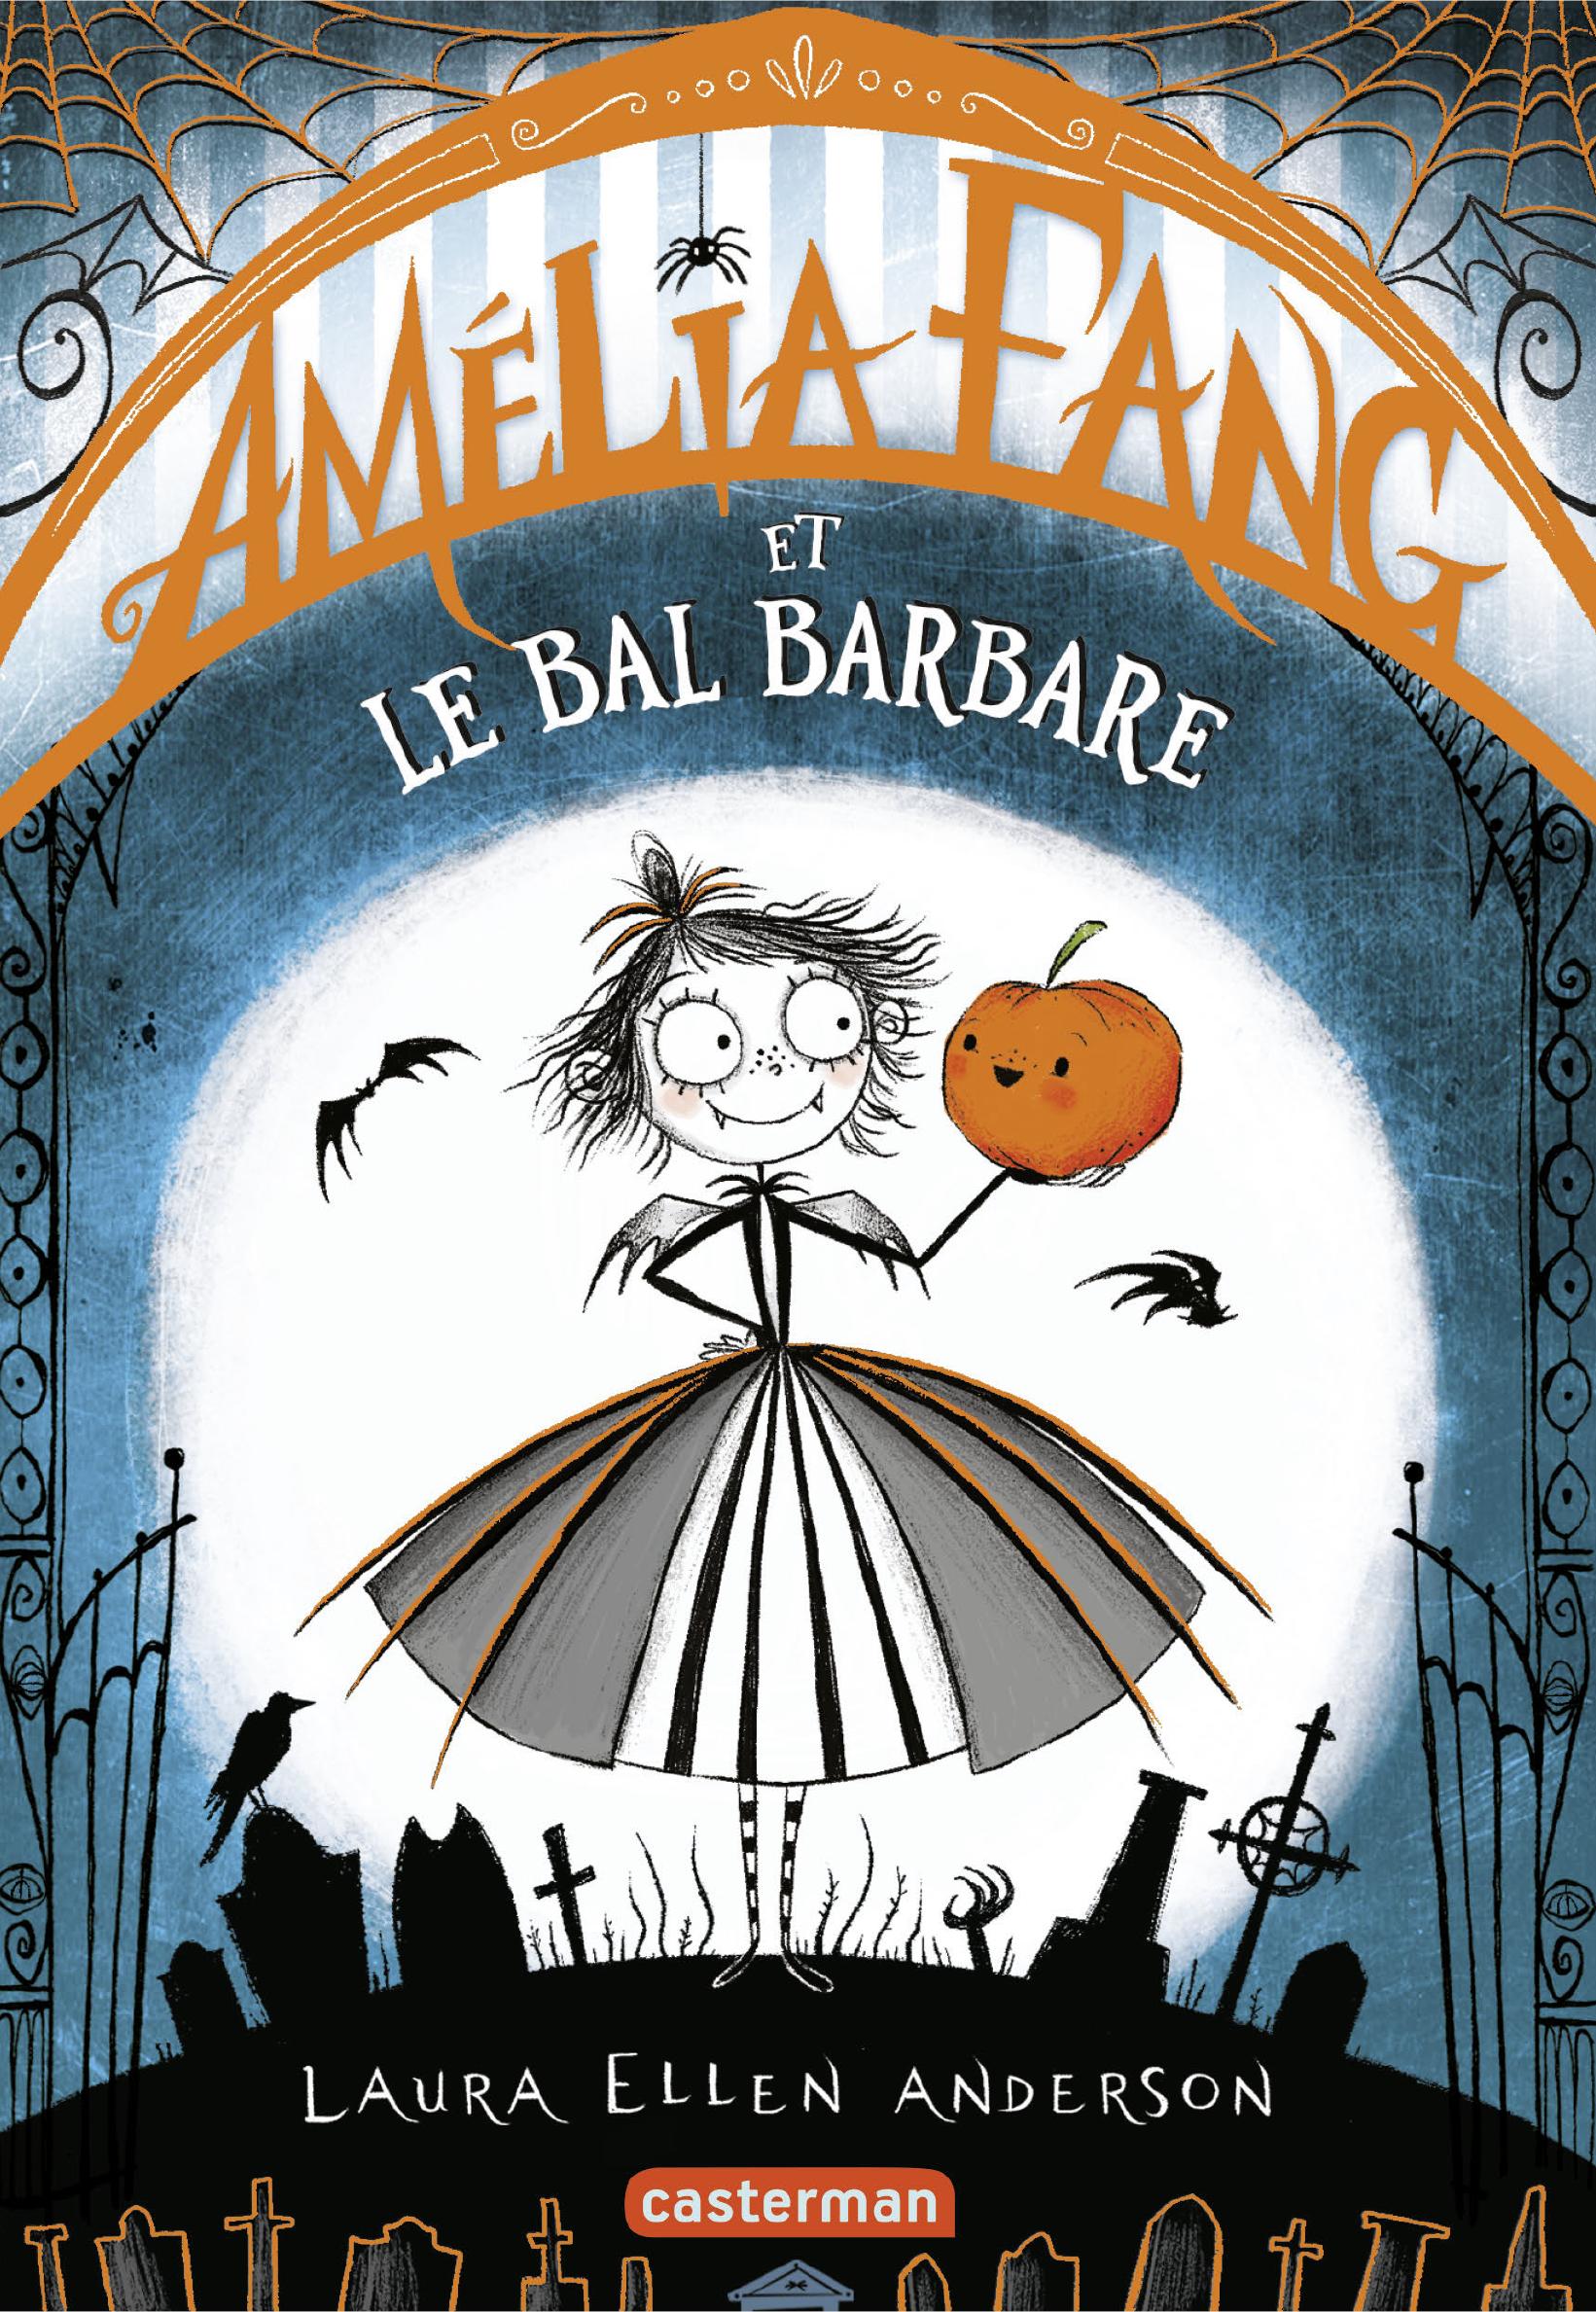 Amélia Fang (Tome 1) - Le Bal barbare | Anderson, Laura Ellen